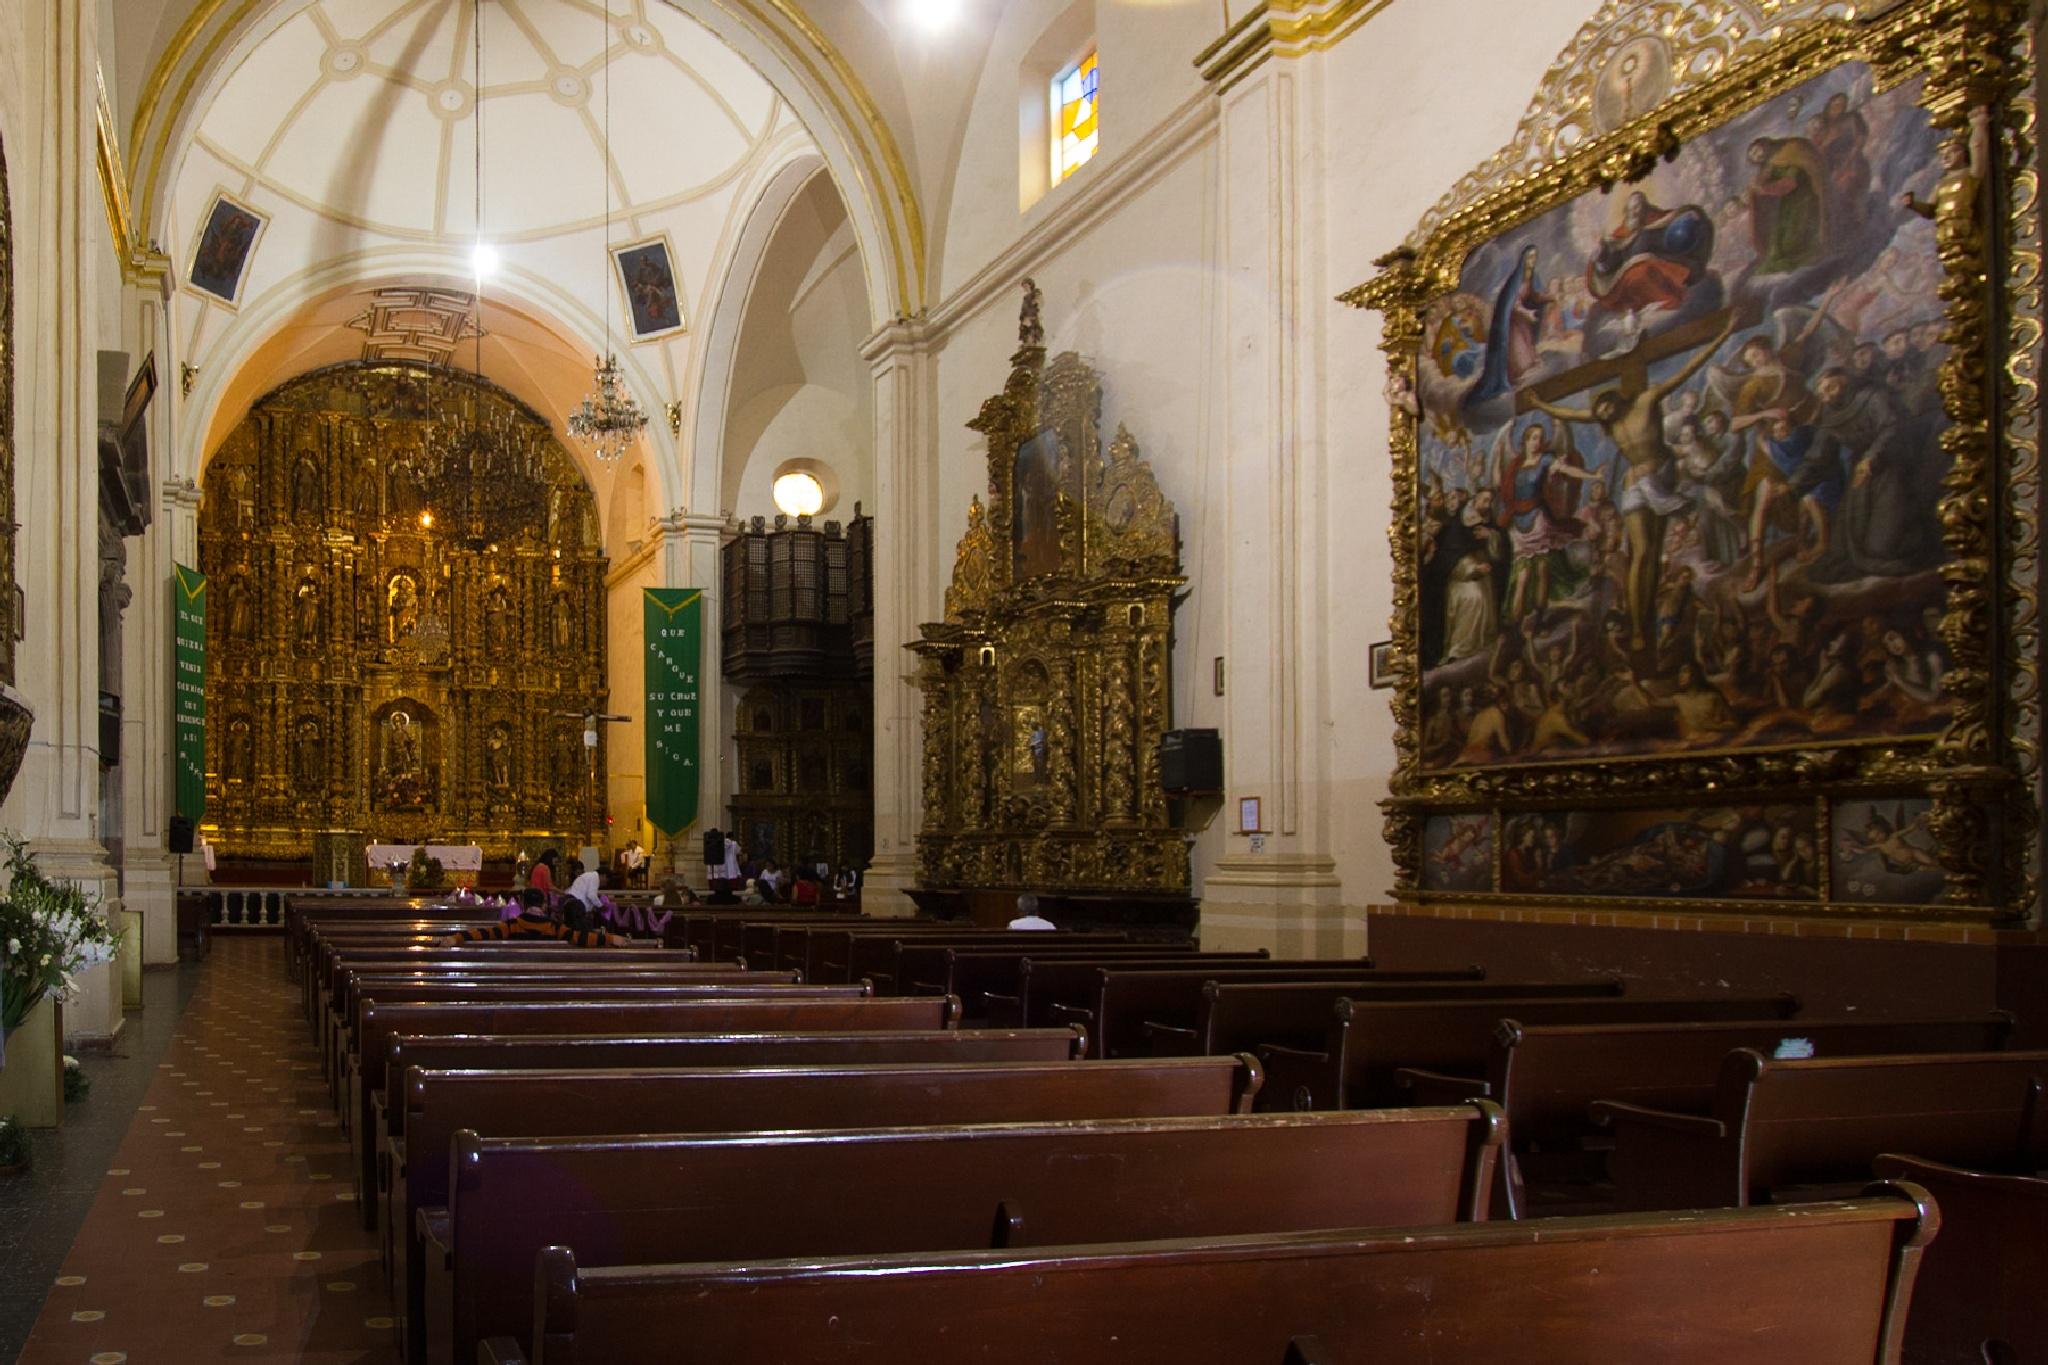 Templo de la Púrisima Concepción, Ozumba by rafael.ornelaseibanez